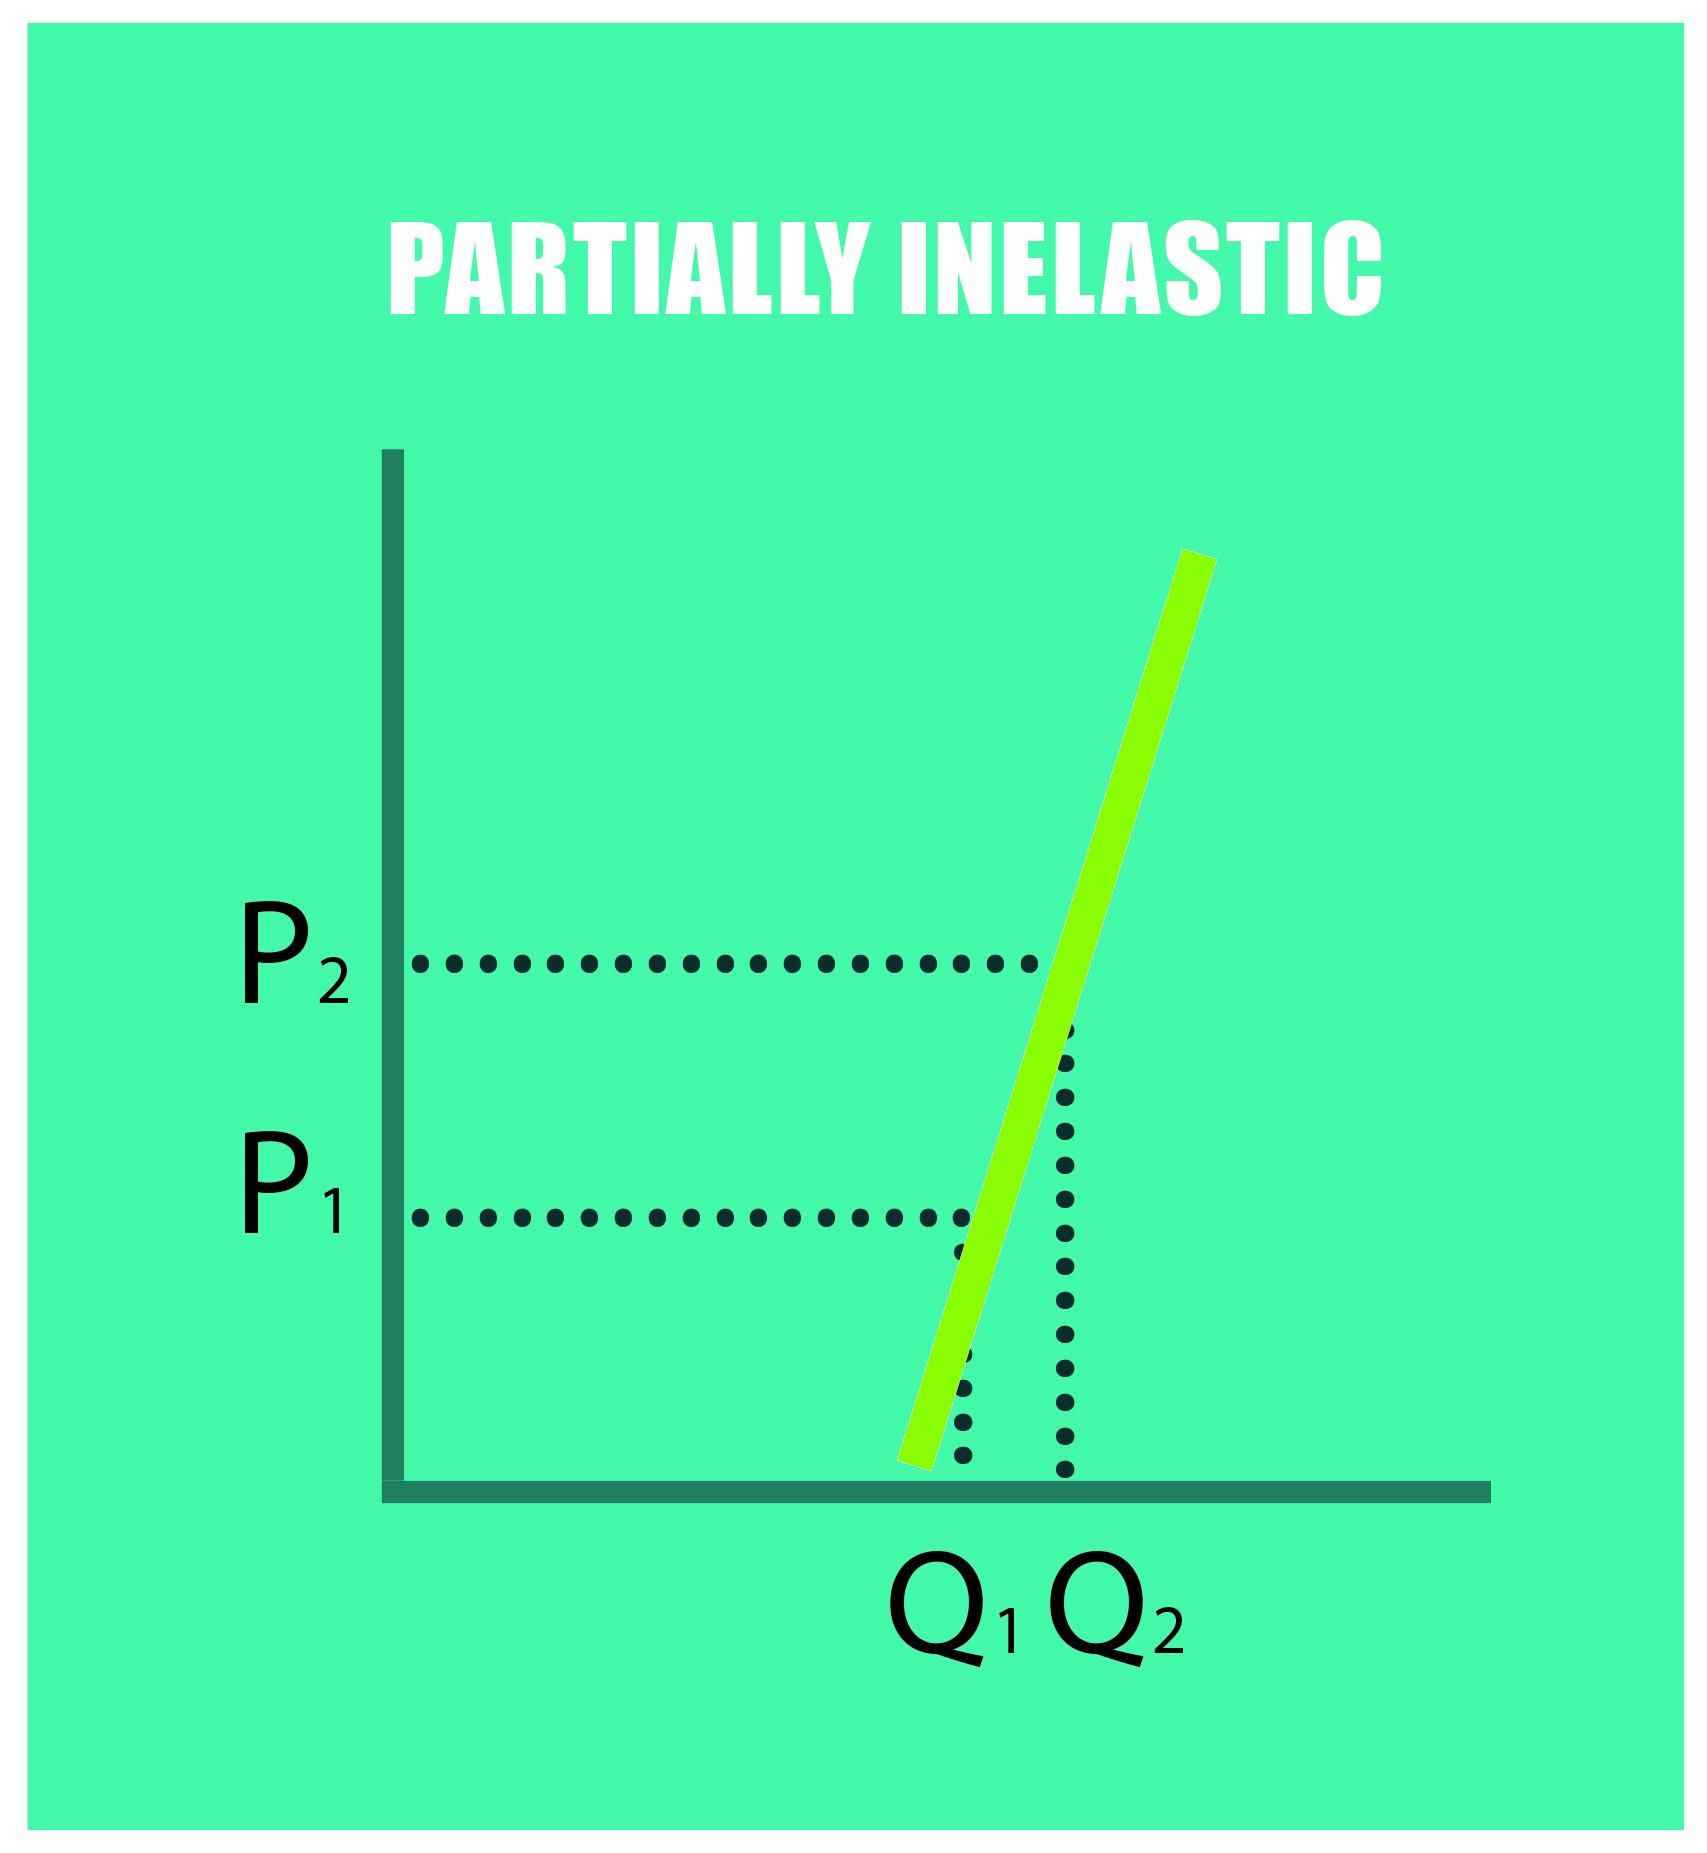 Partially inelastic